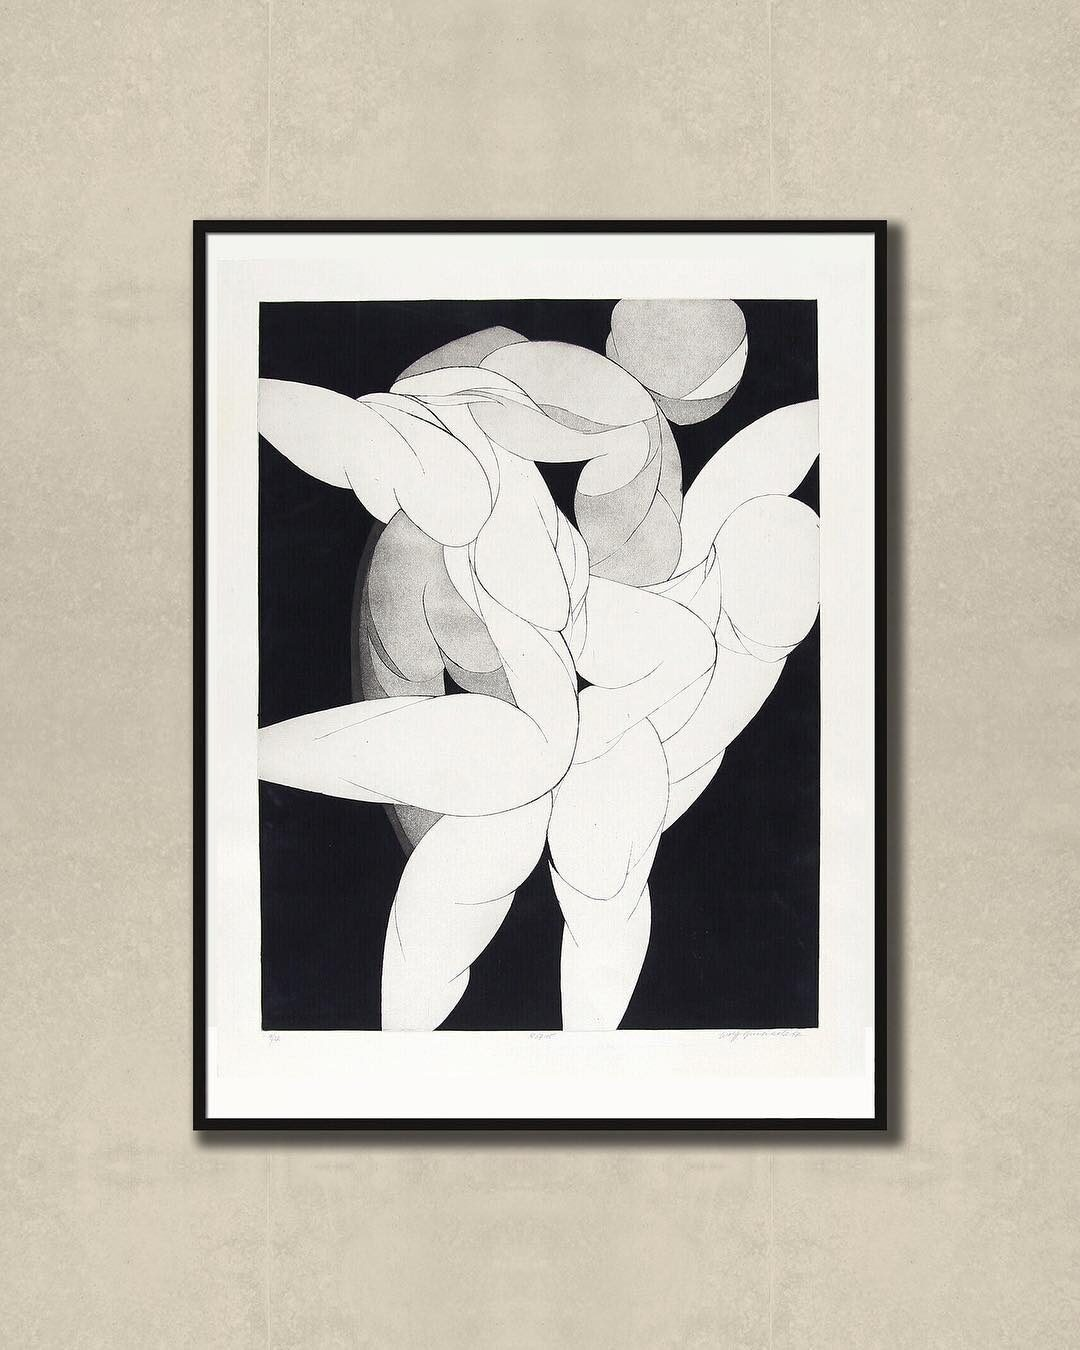 Wolff Buchholz - Untitled